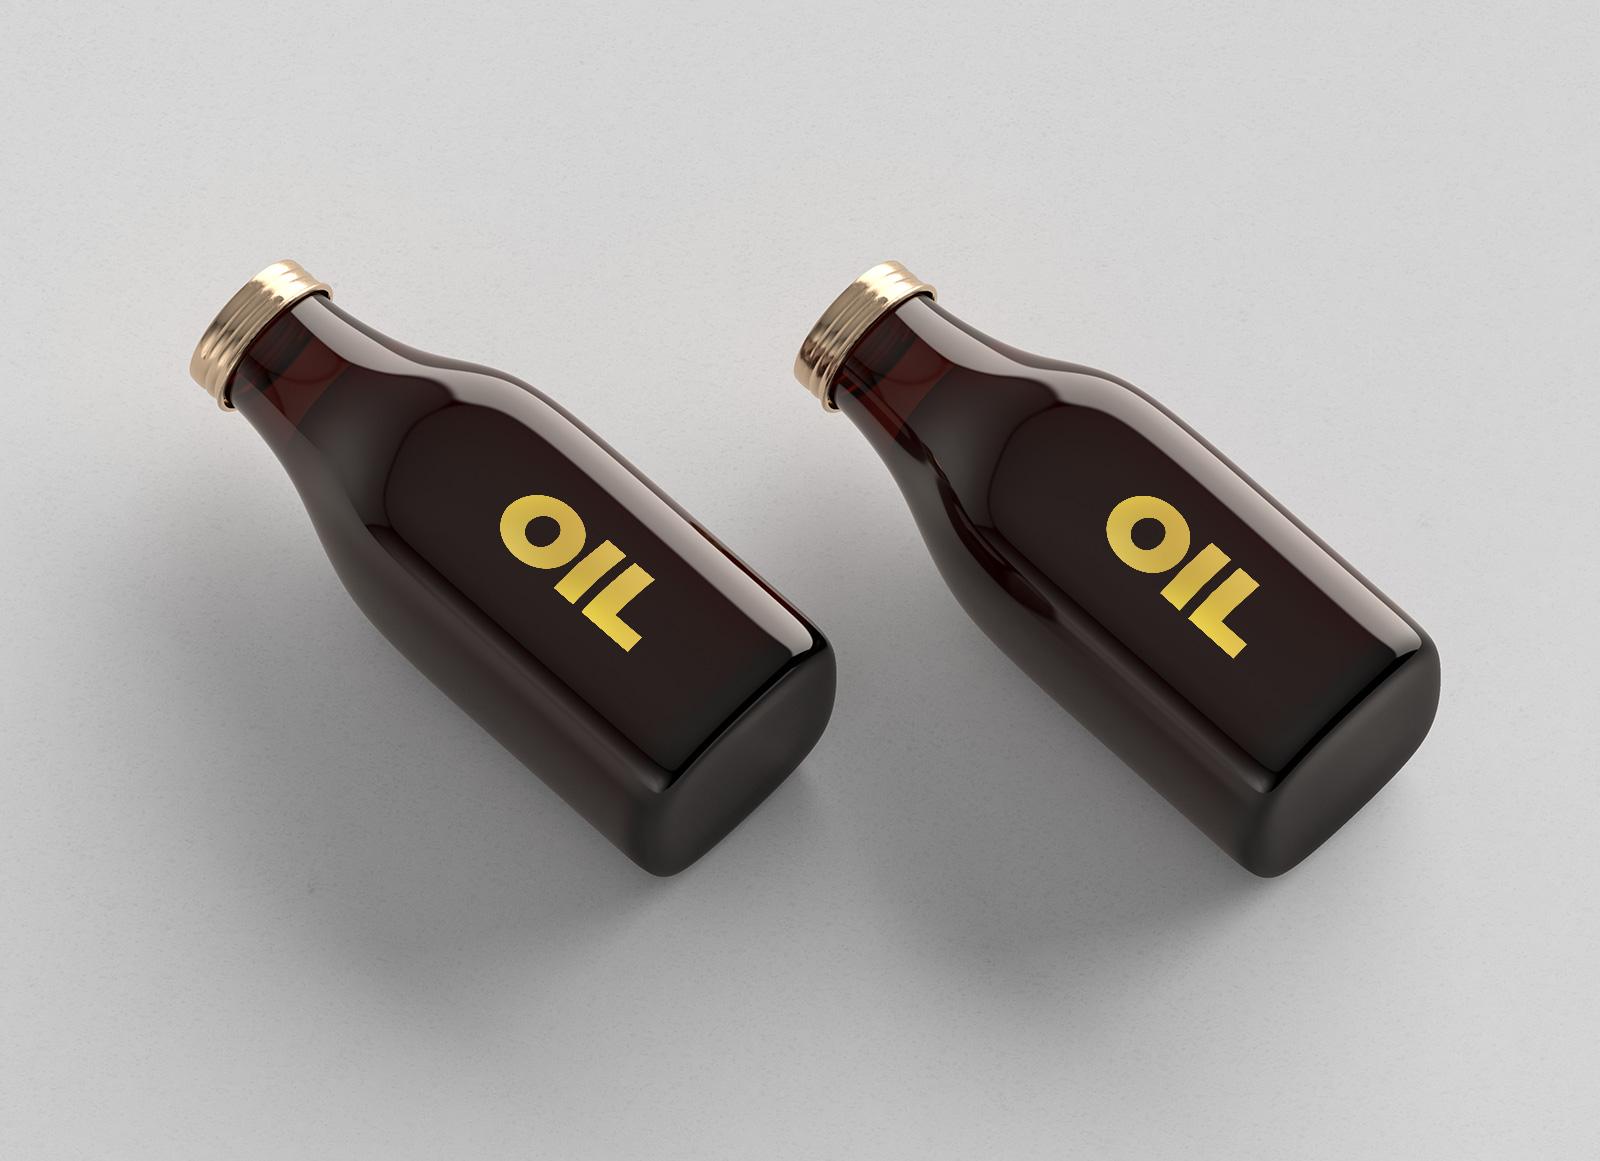 Free-Oil-Glass-Bottle-Mockup-PSD